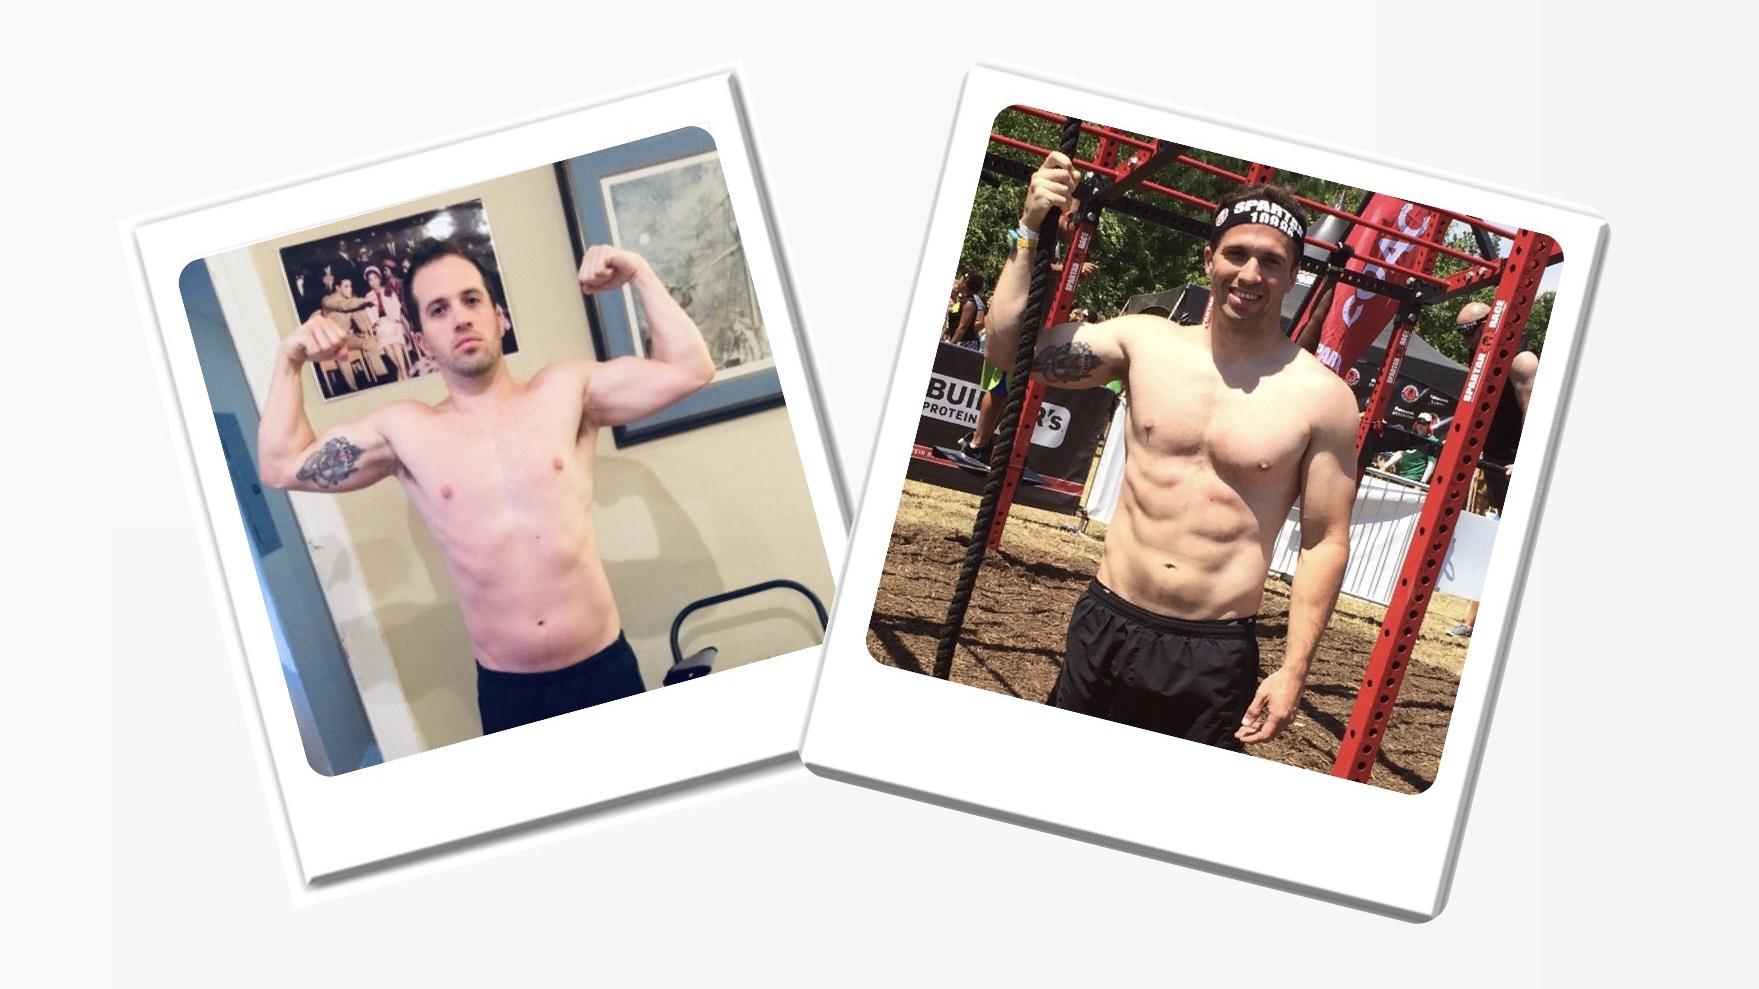 Built 6lbs of muscle - Blake shy , 36